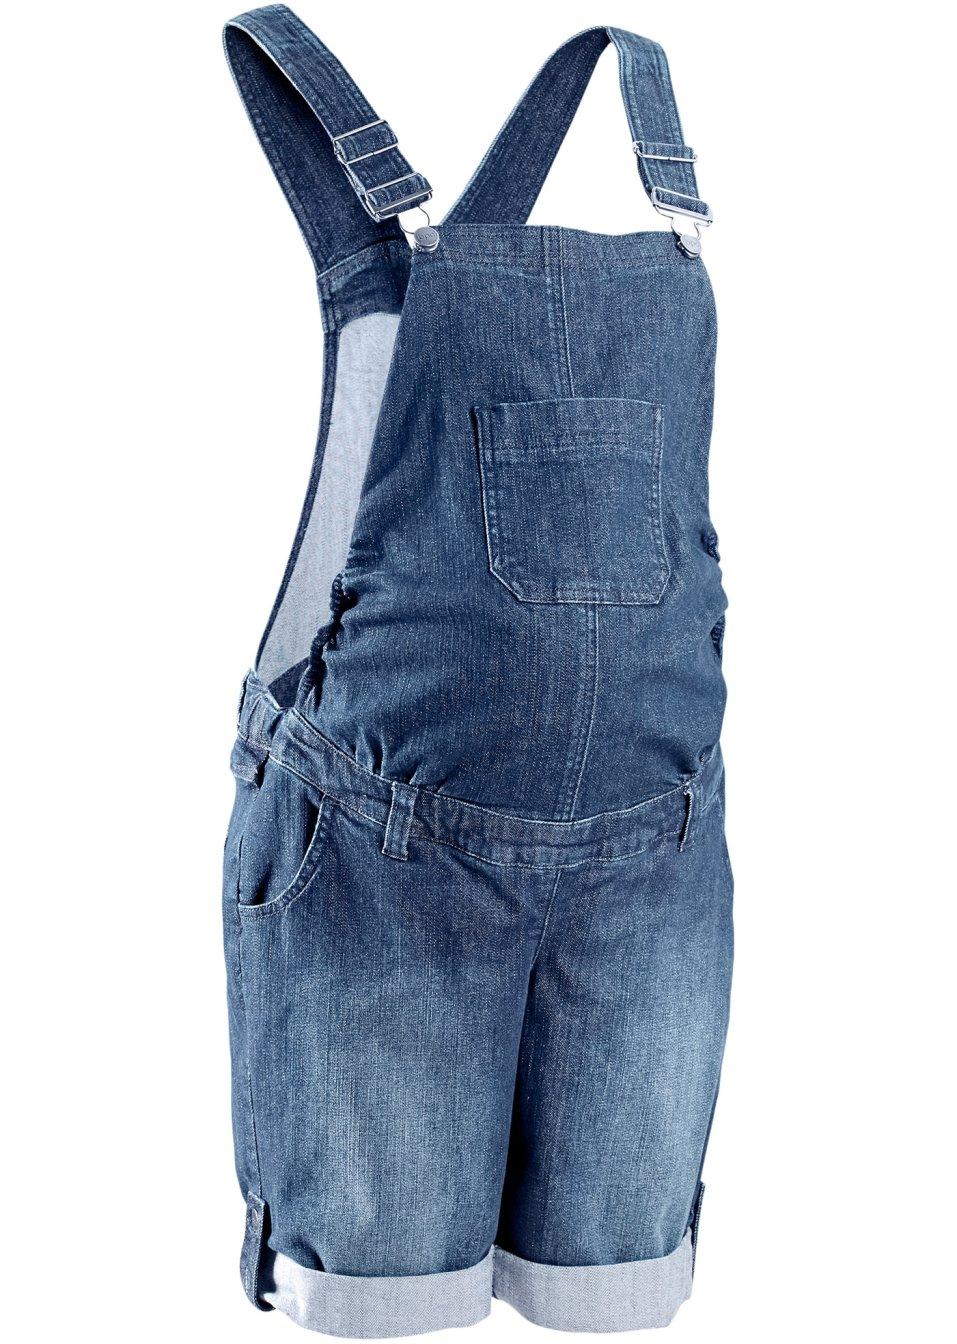 sommerliche latzhose als jeansshorts f r schwangere blue. Black Bedroom Furniture Sets. Home Design Ideas